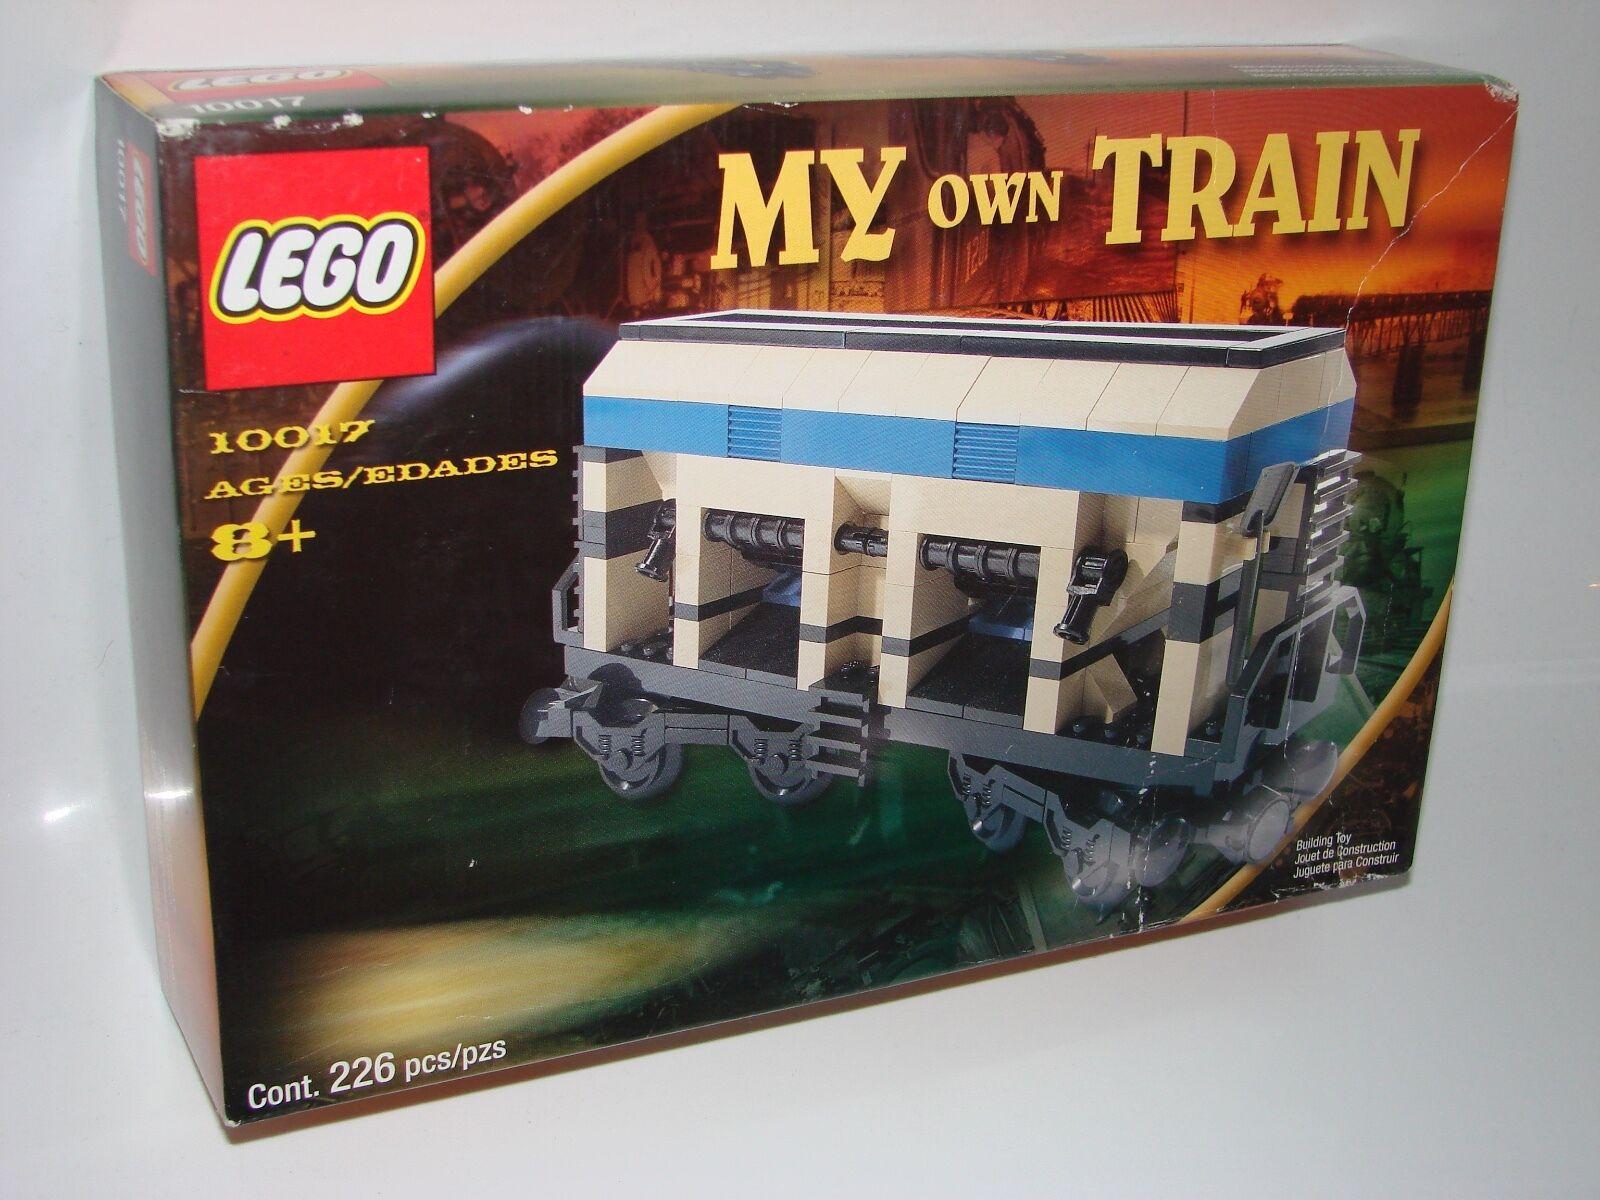 Lego ® my own Train 10017 incluso de carga carro nuevo embalaje original _ Hopper Wagon New misb NRFB